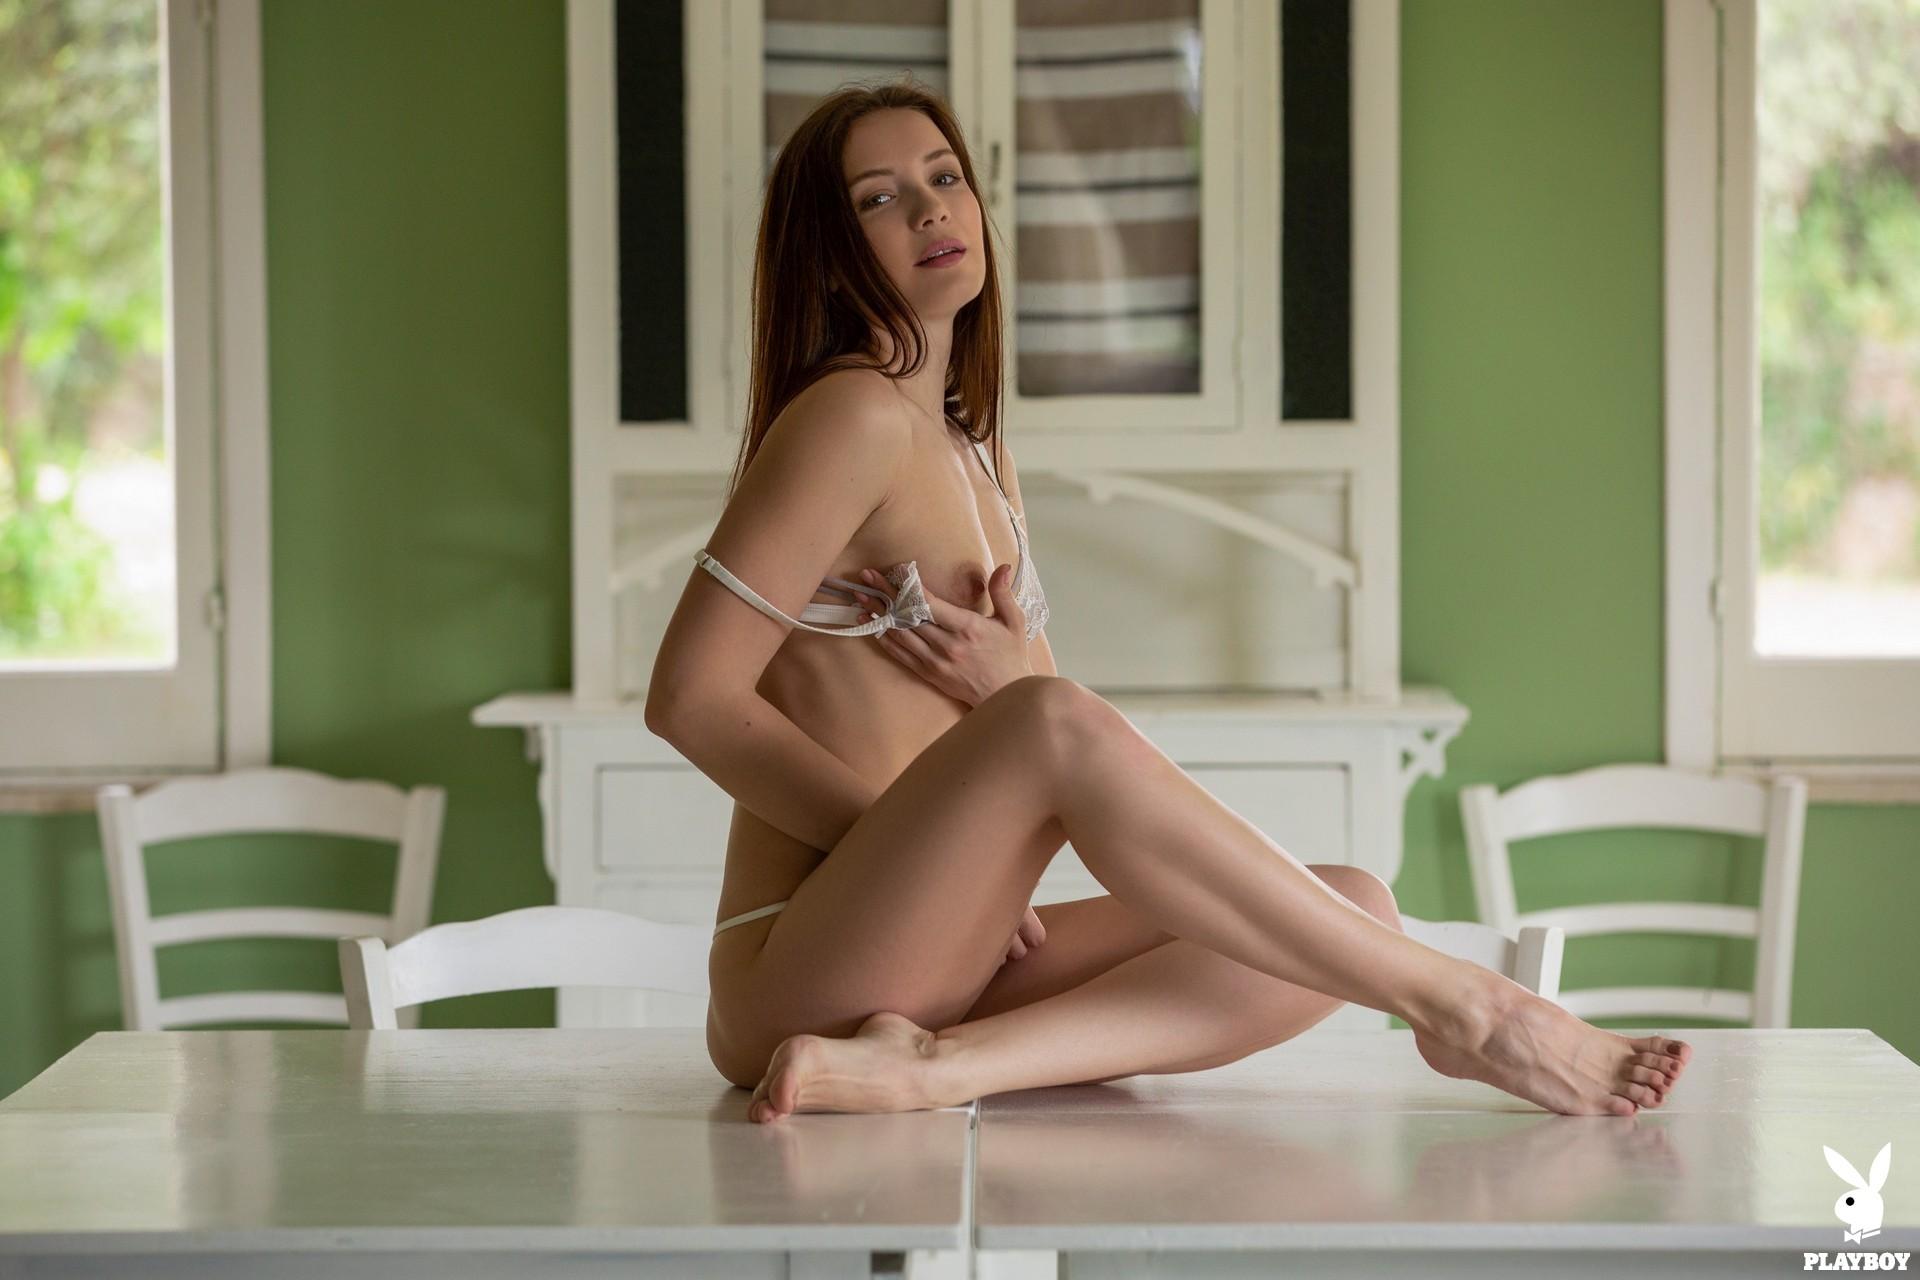 Janeth Tense in Delightful Daybreak - Playboy Plus 39